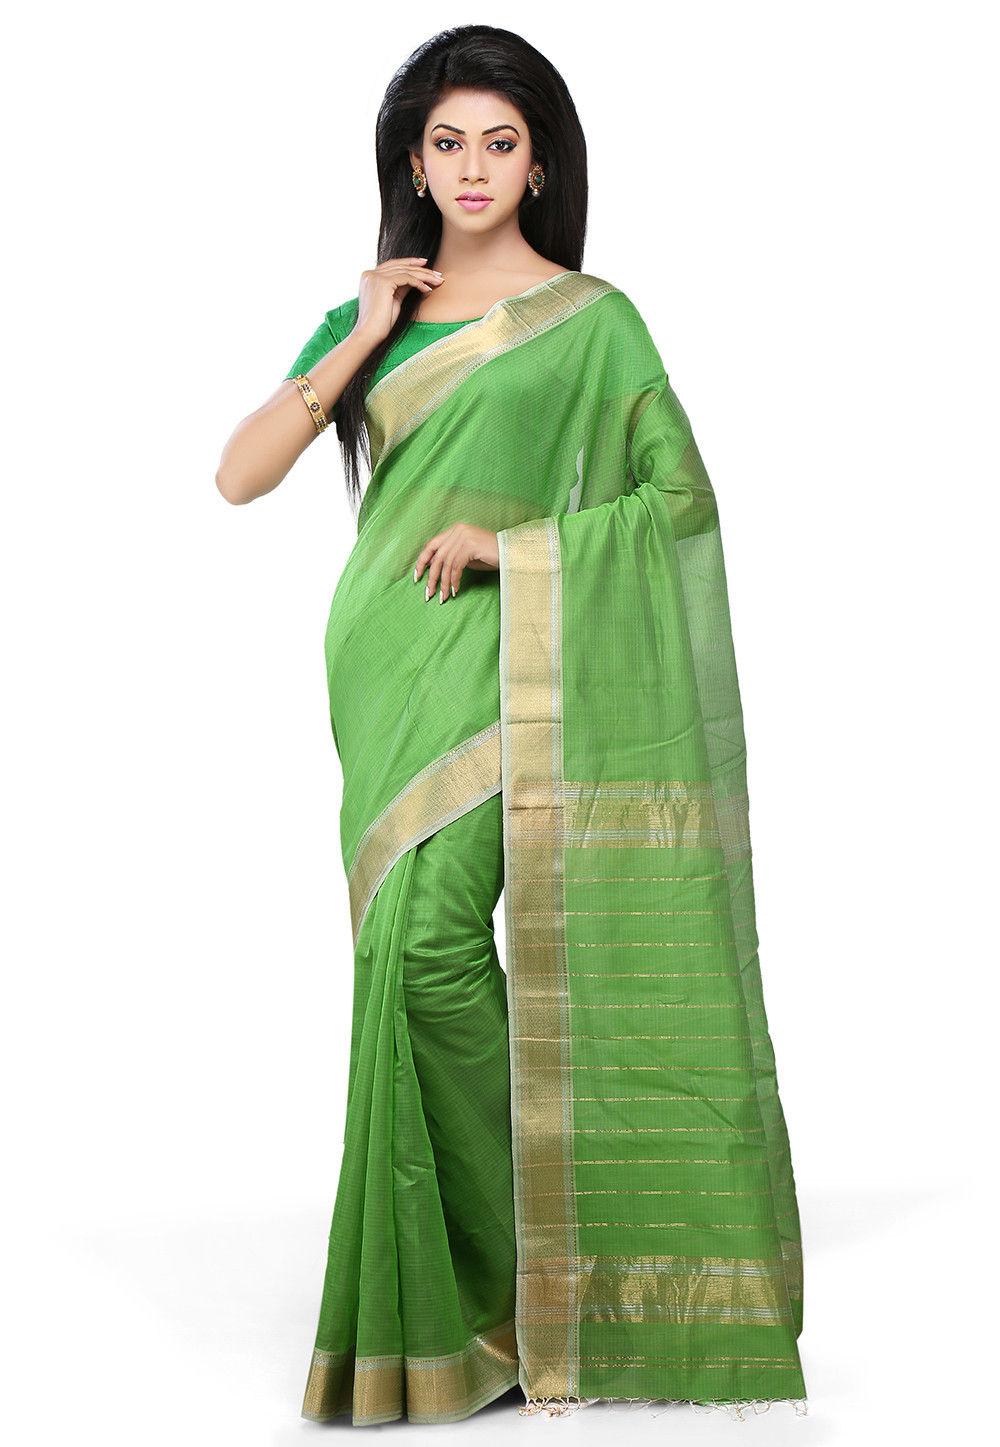 Woven Cotton Silk Saree in Neon Green